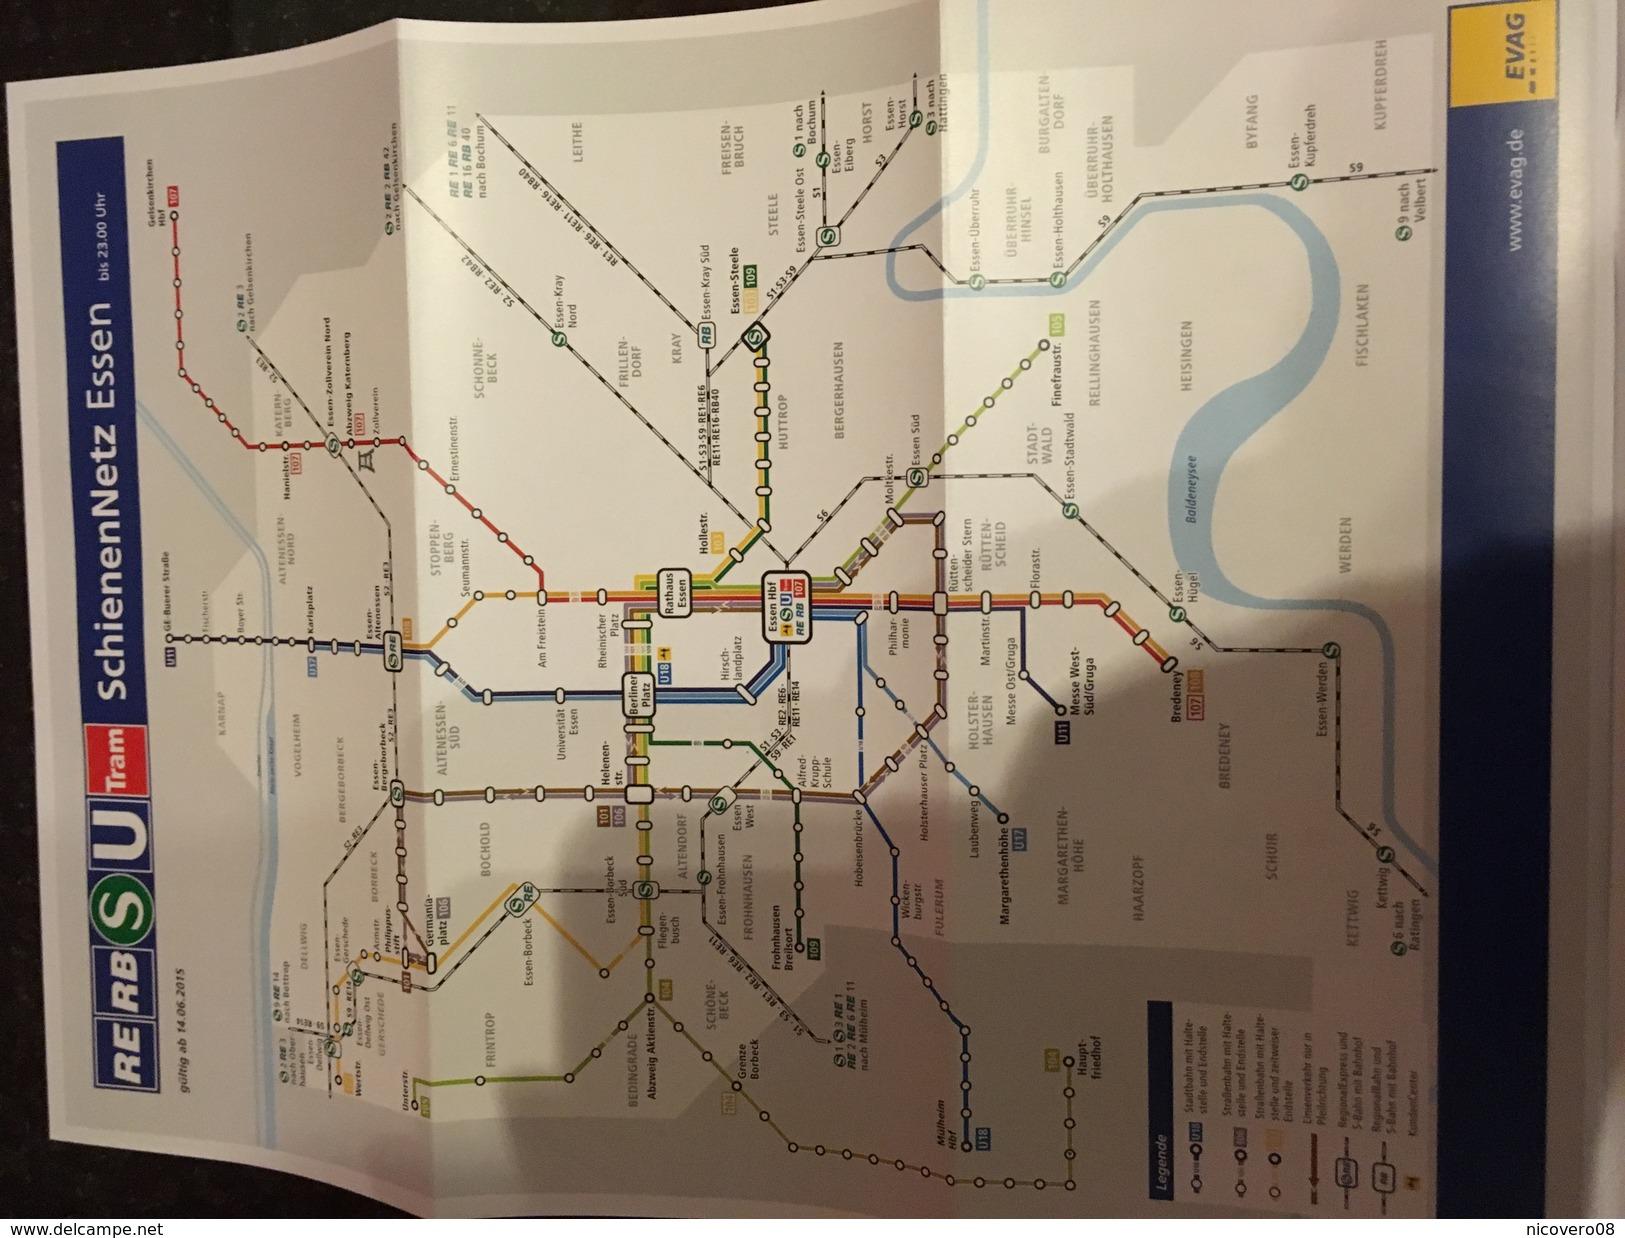 Transit Map Essen + City Map - Subway Bus Tram - World